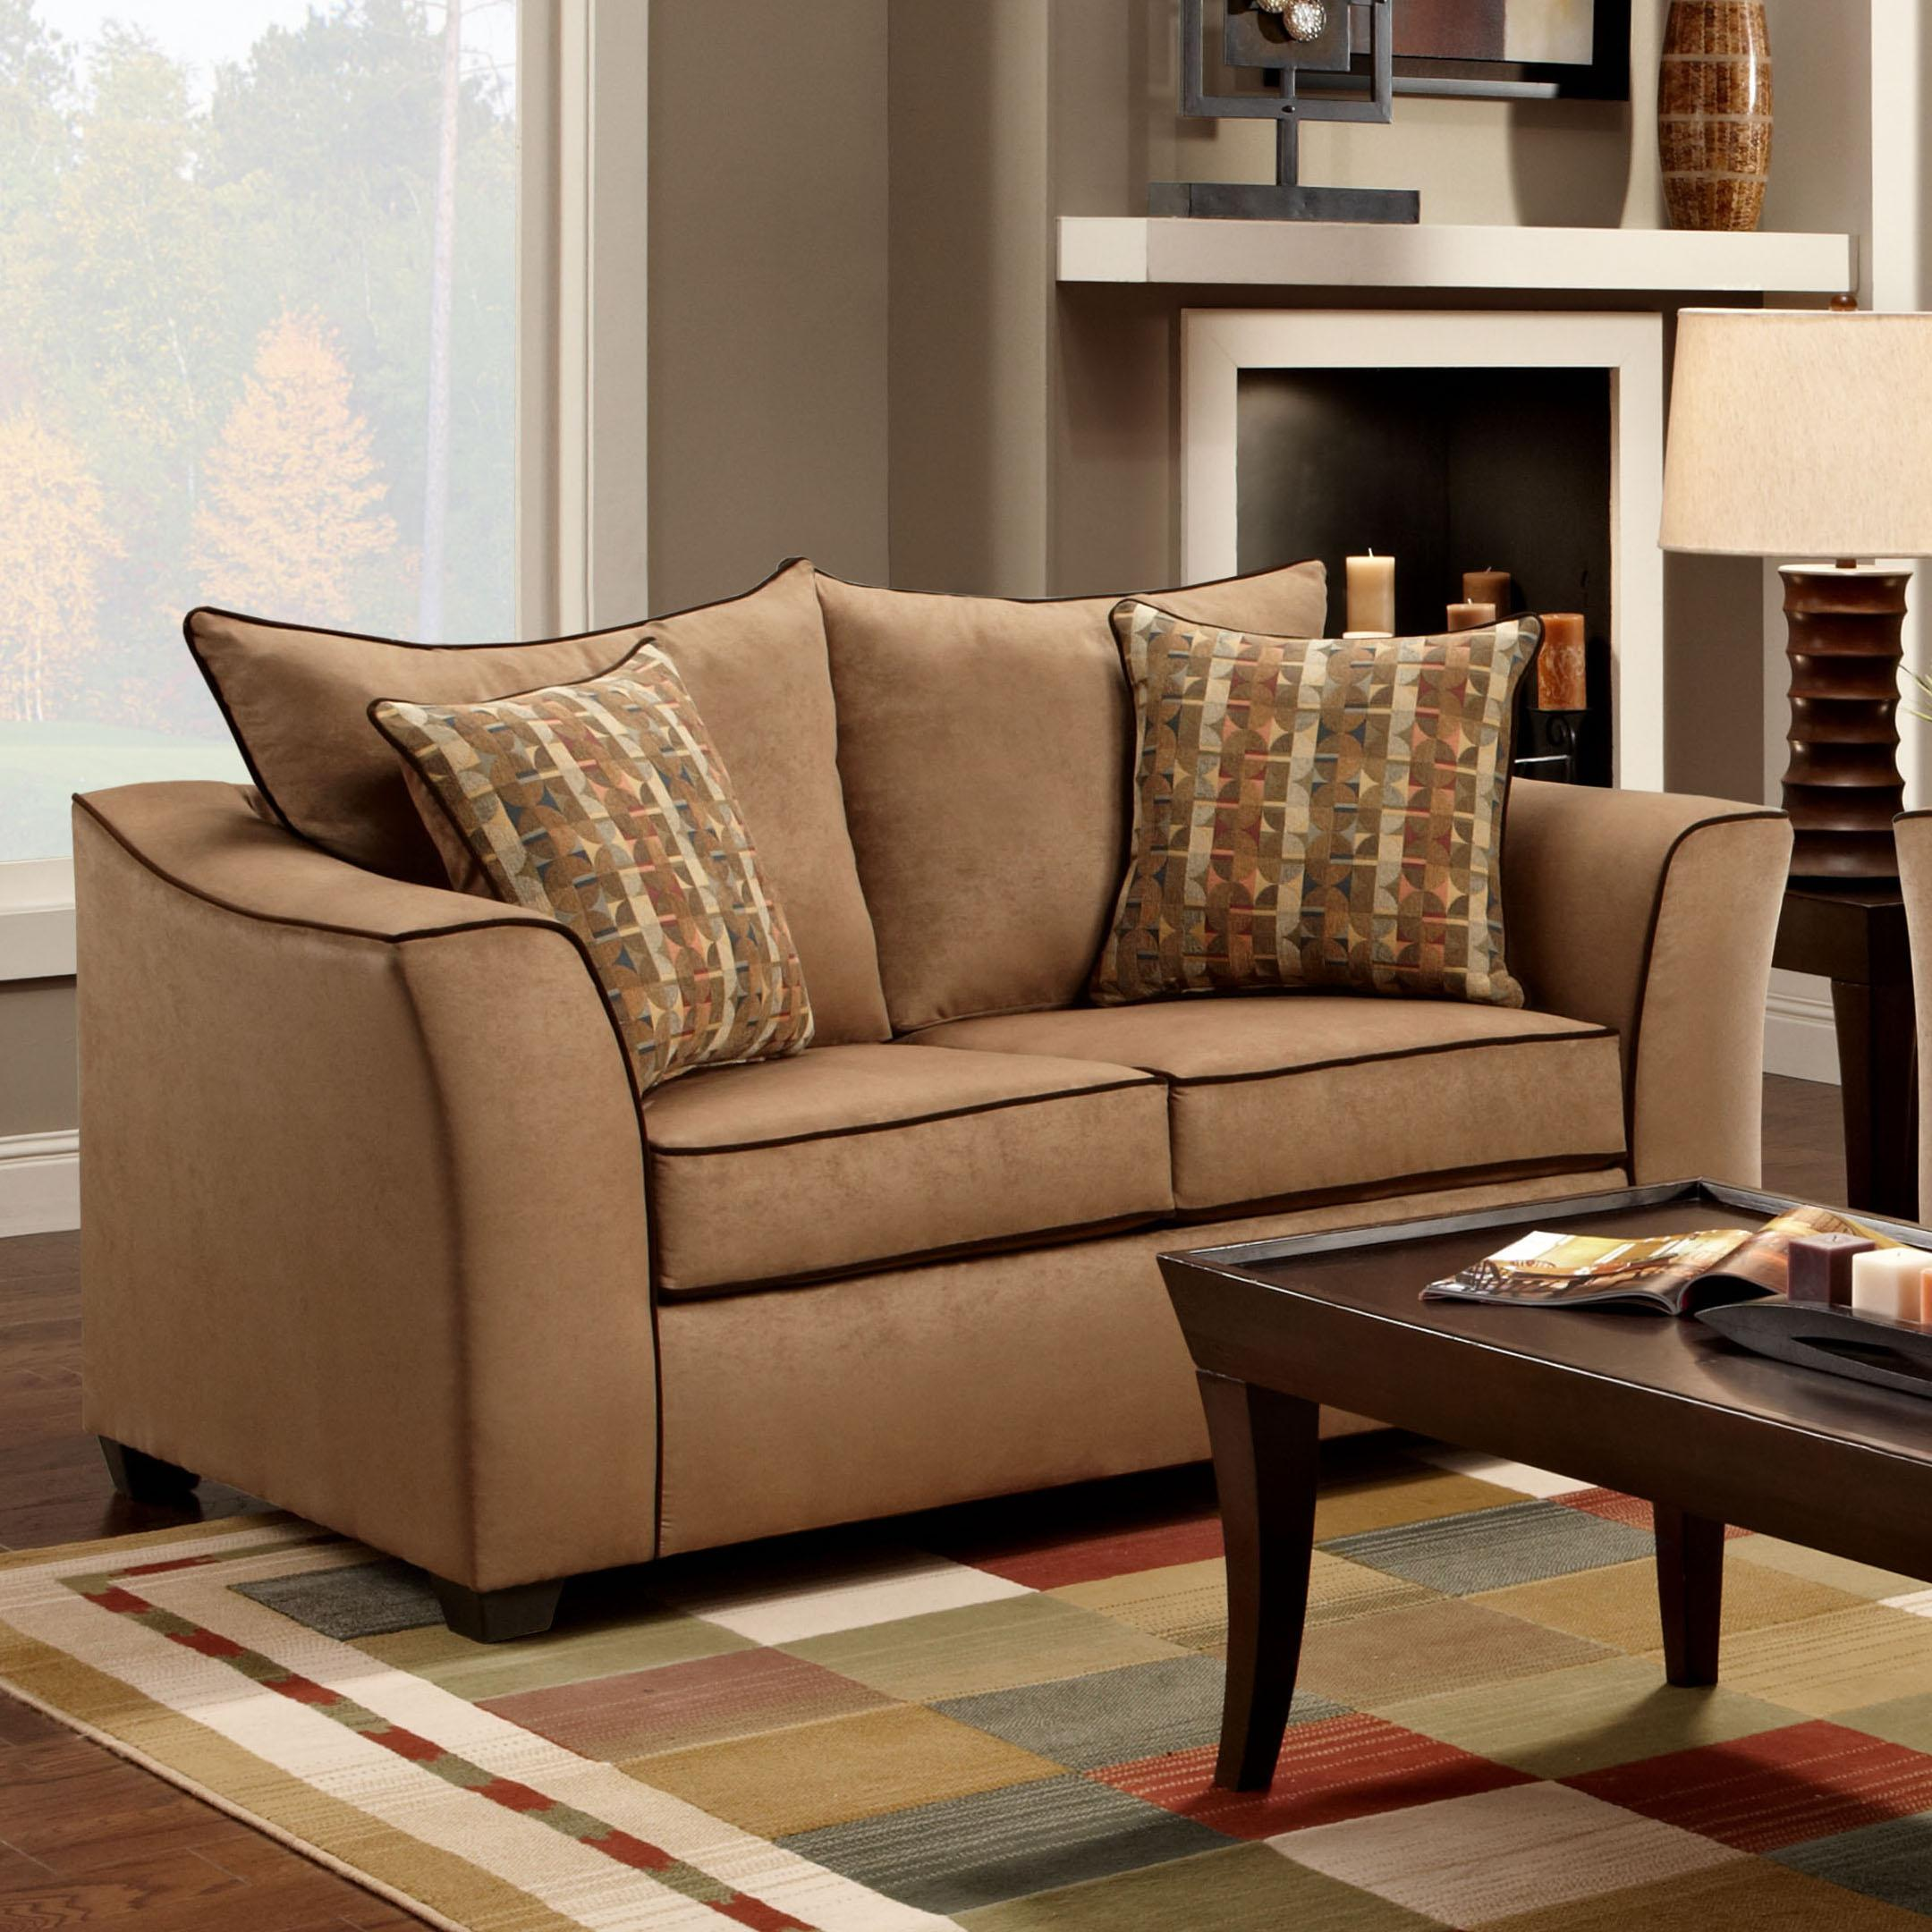 1160 Stationary Loveseat by Washington Furniture at Lynn's Furniture & Mattress